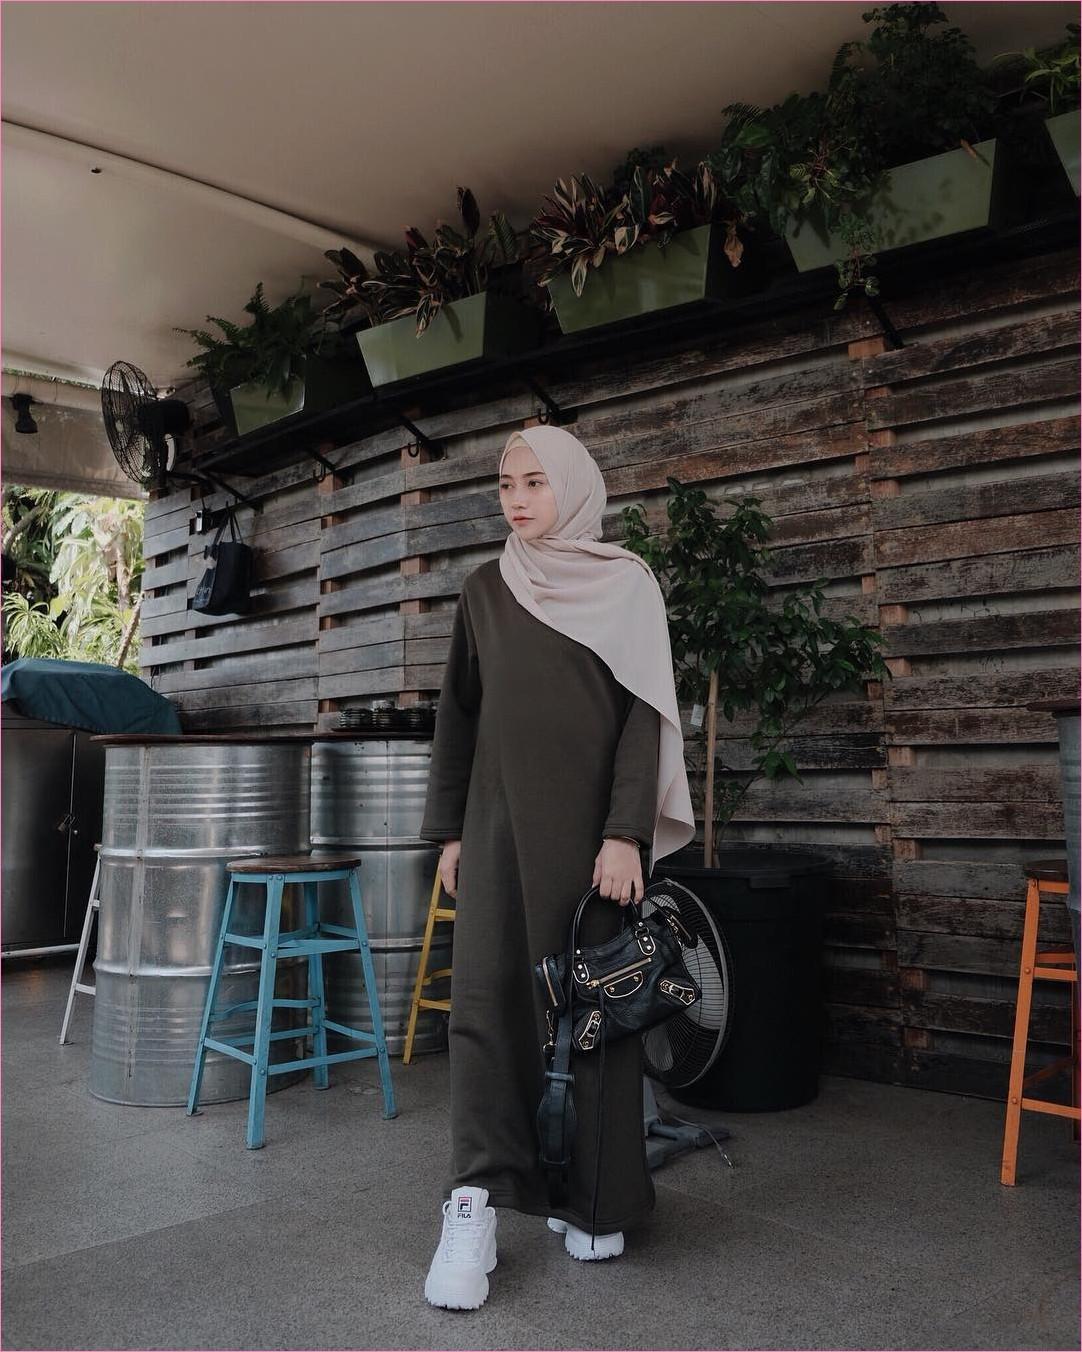 Outfit Kerudung Pashmina Ala Selebgram 2018_hijab_pashmina diamond krem_ciput rajut_baju abaya hijau army_kets_sneakers putih_handbags hitam_trendy_kekinian_ootd_legging_kipas angin_pohon_tembok kayu_kursi kayu